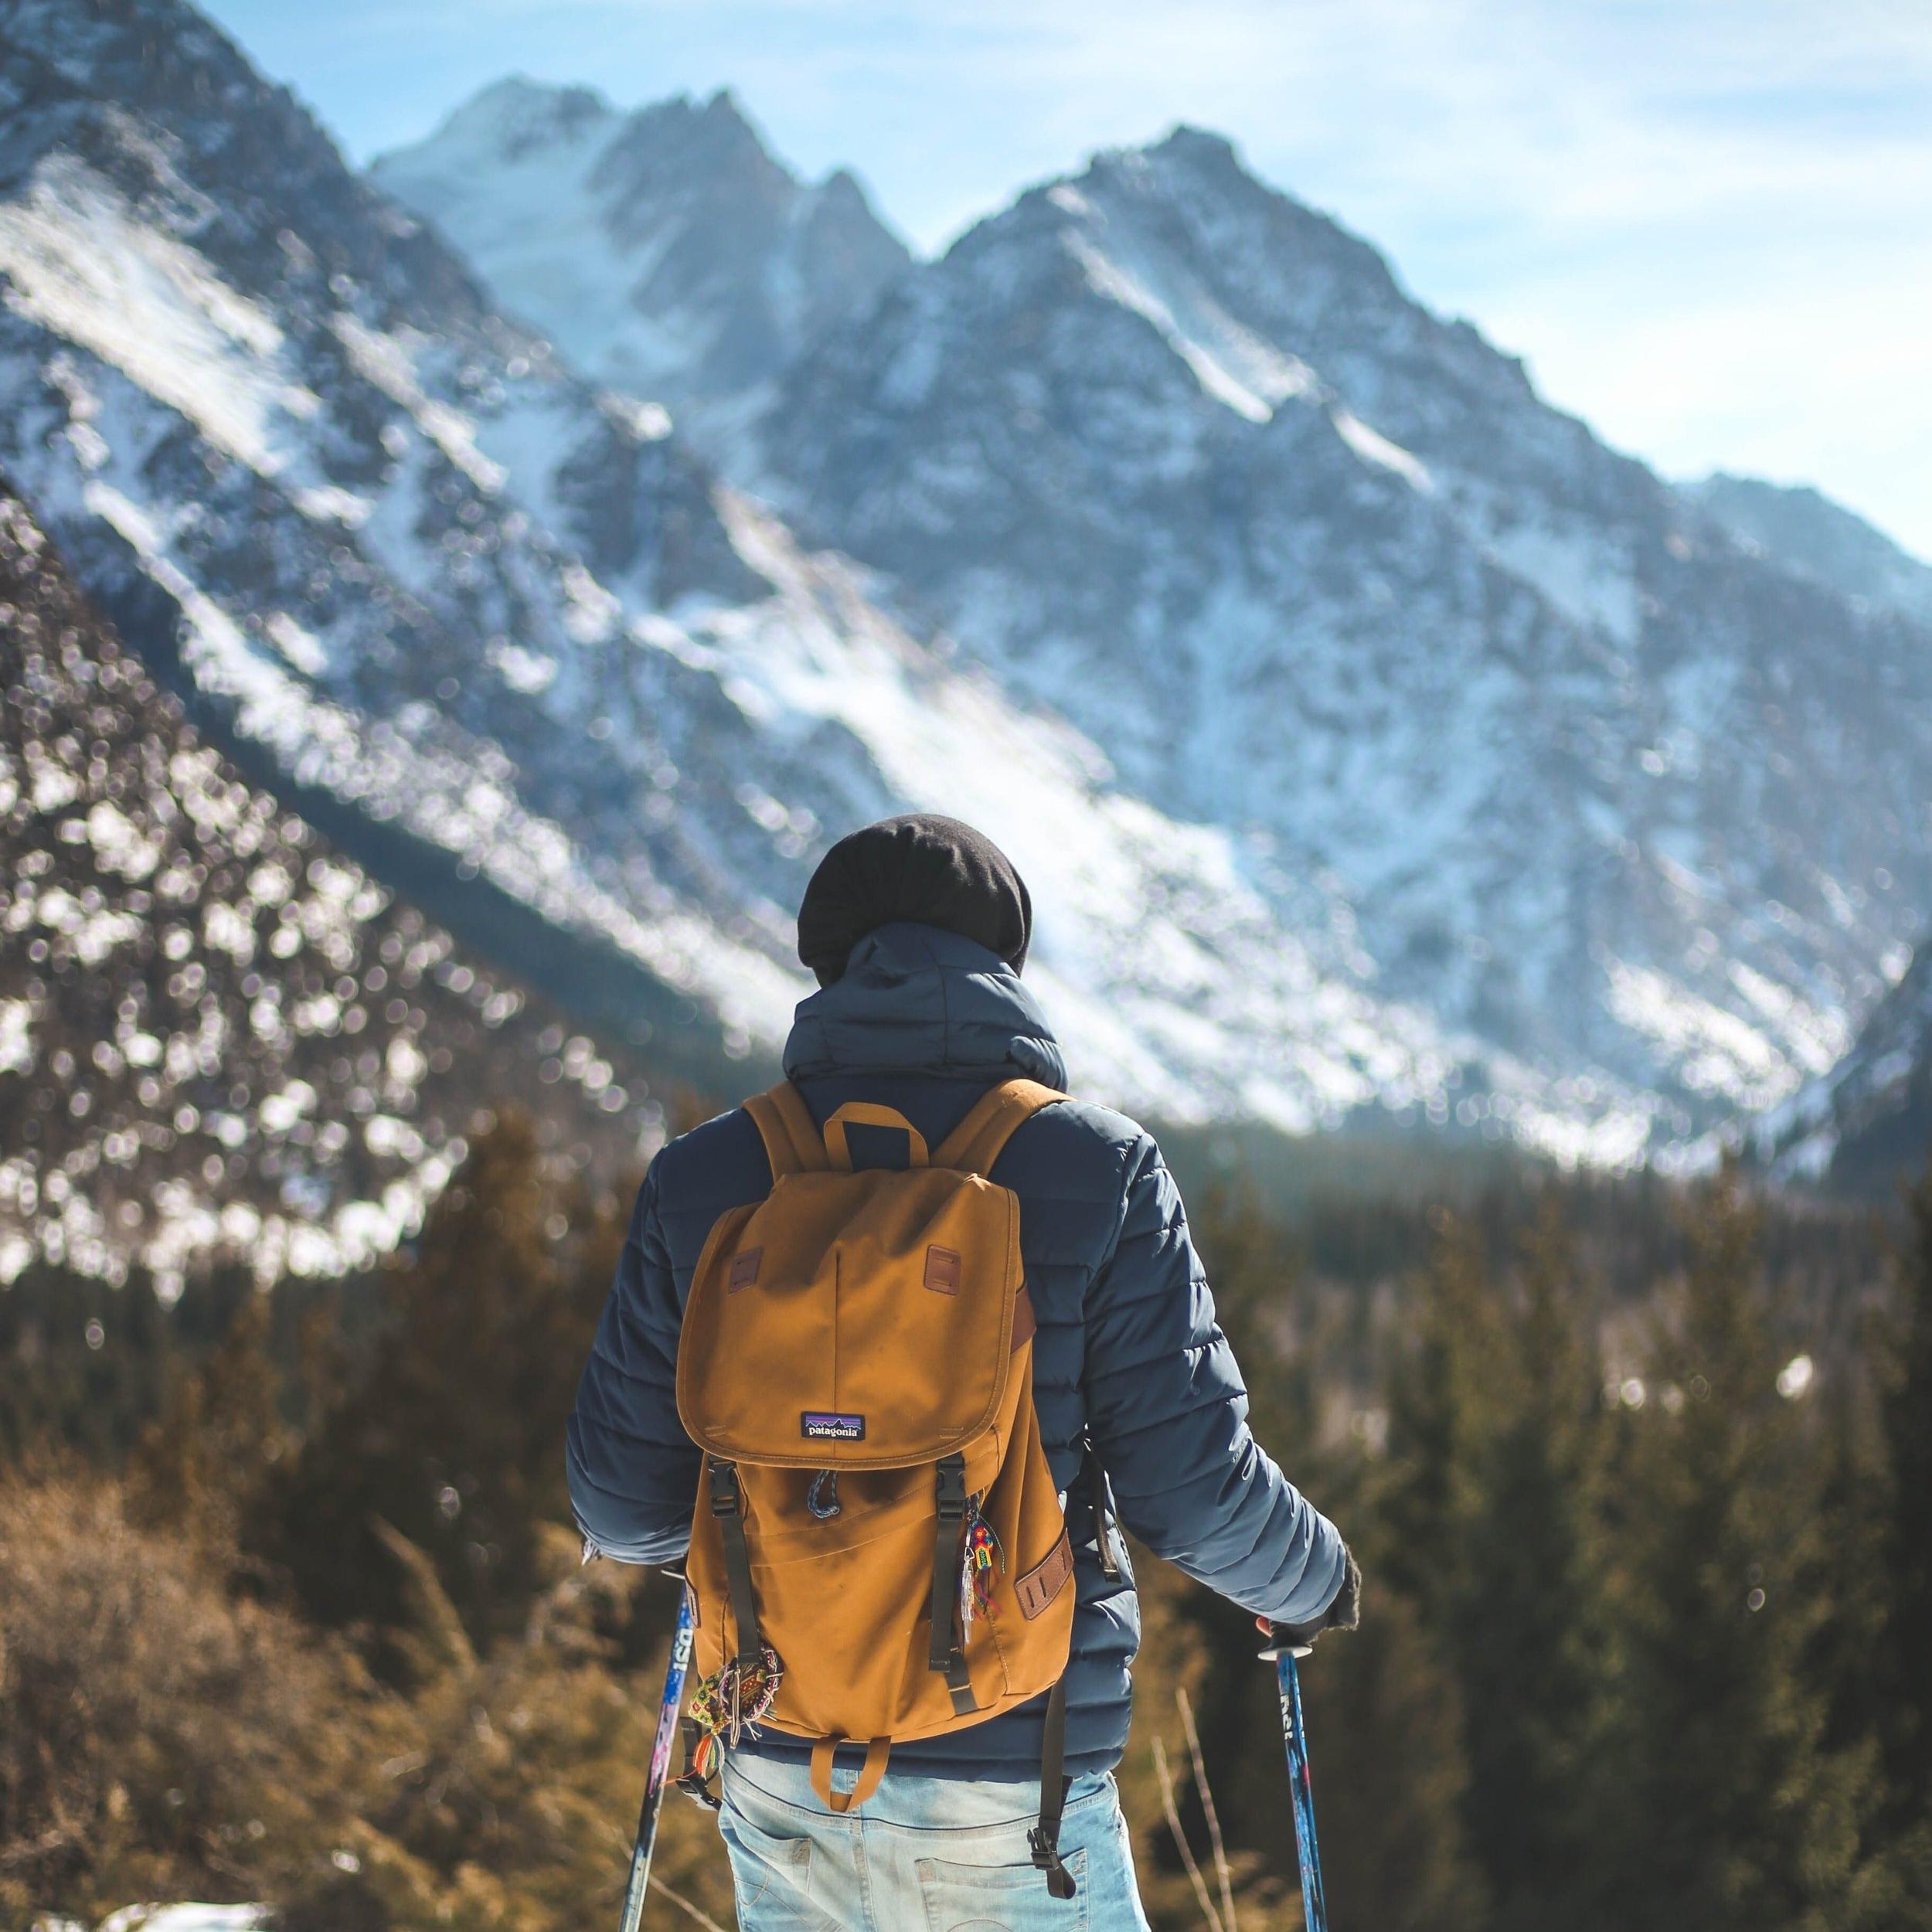 backpack-climber-cold-868096.jpg